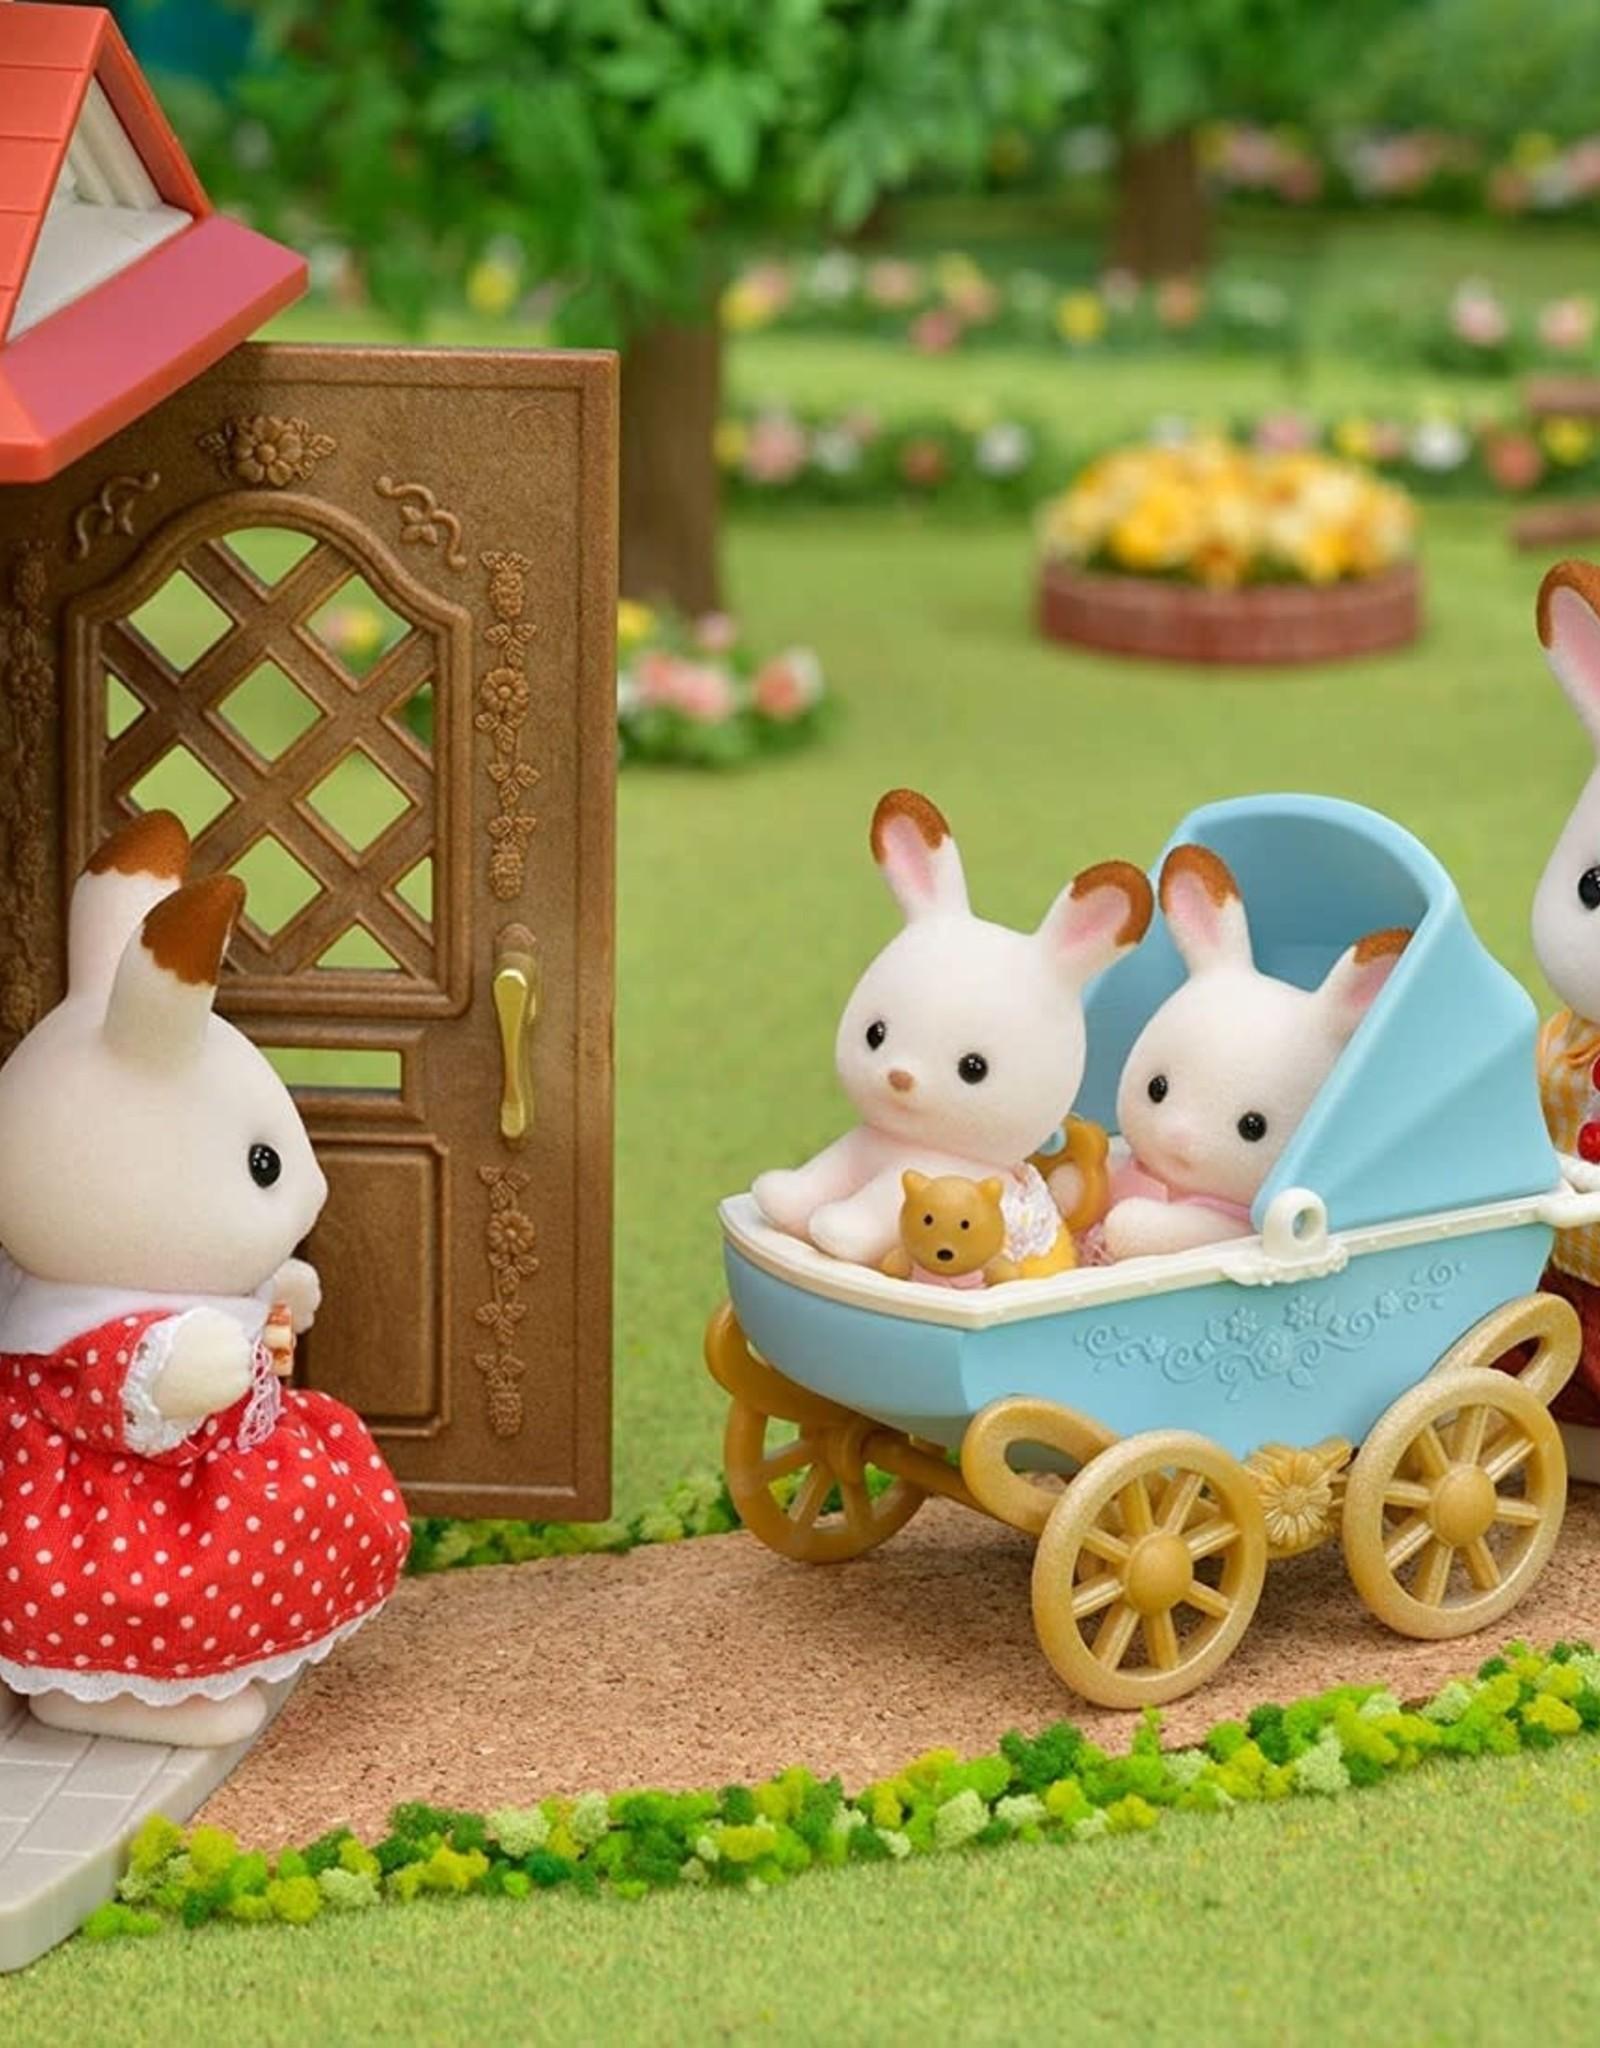 Sylvanian Families Chocolade Konijn Tweeling set